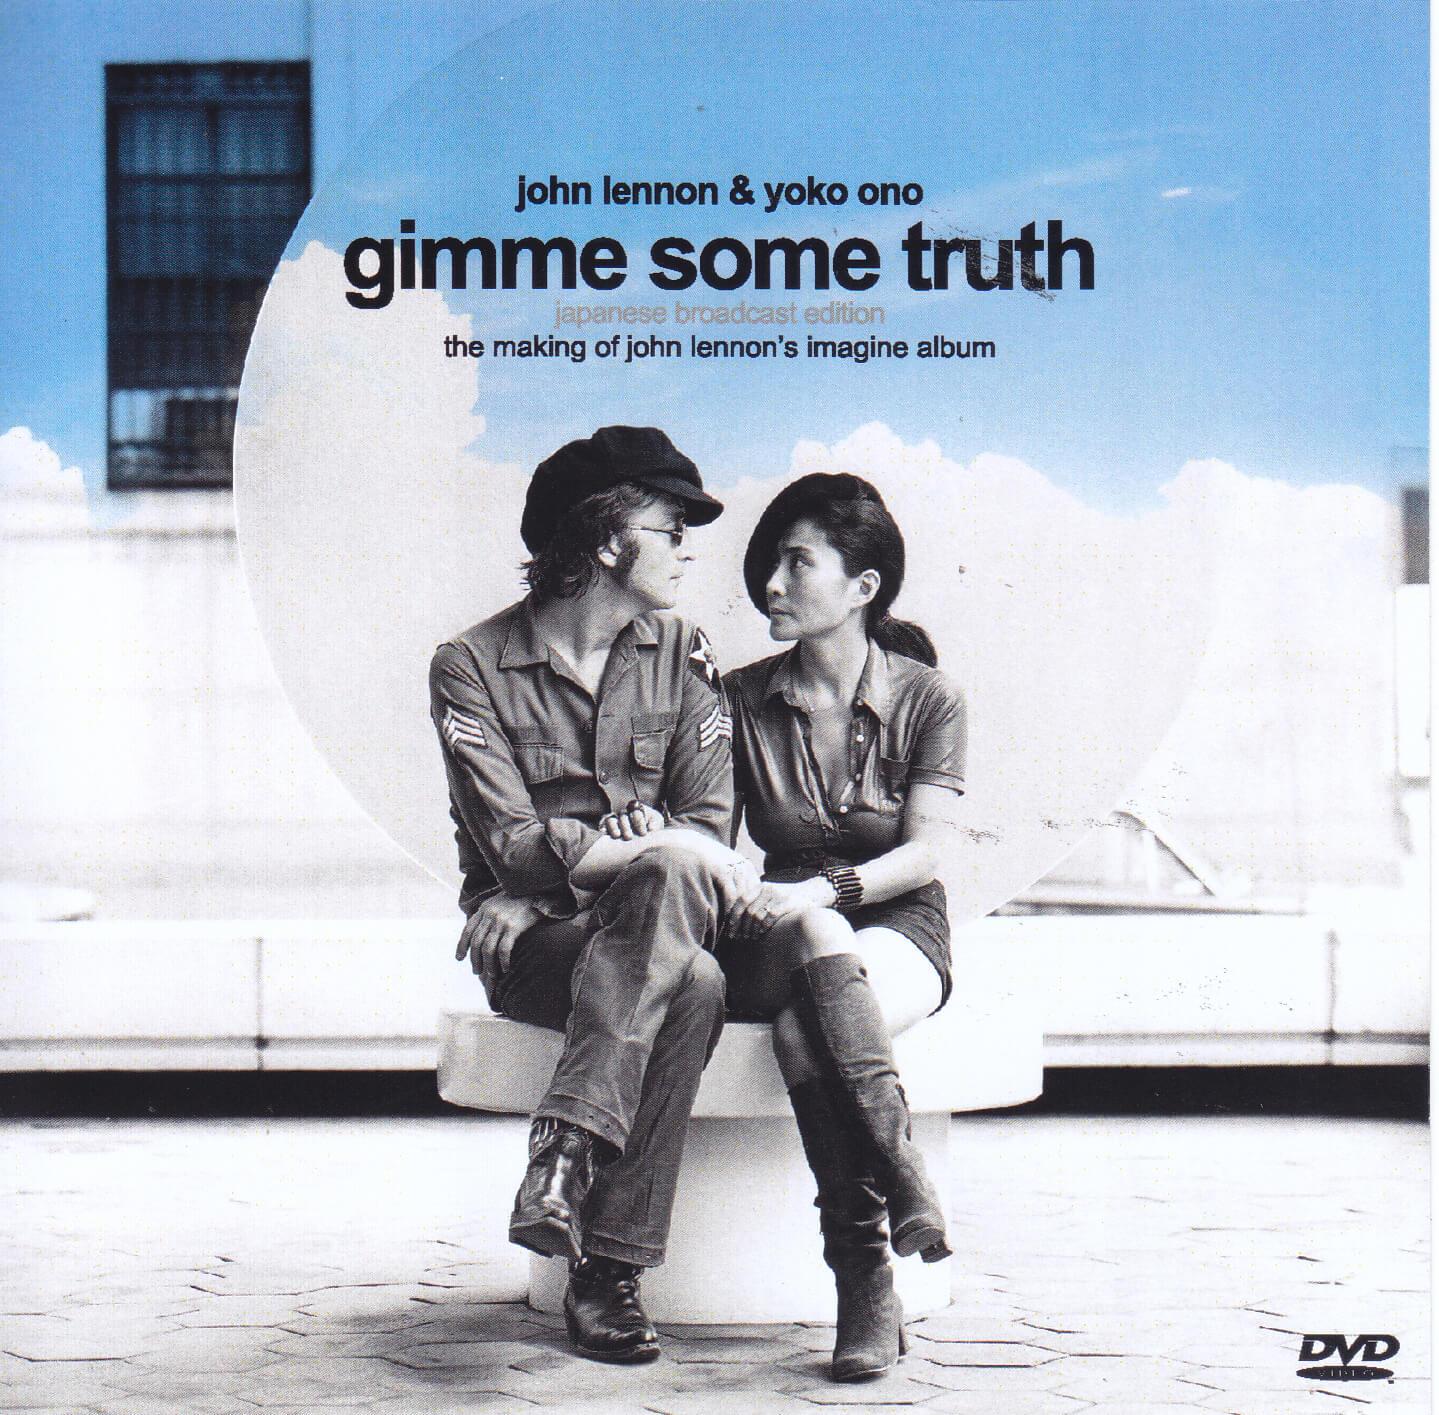 John Lennon Yoko Ono Gimme Some Truth Japanese Broadcast Edition 1dvdr Giginjapan